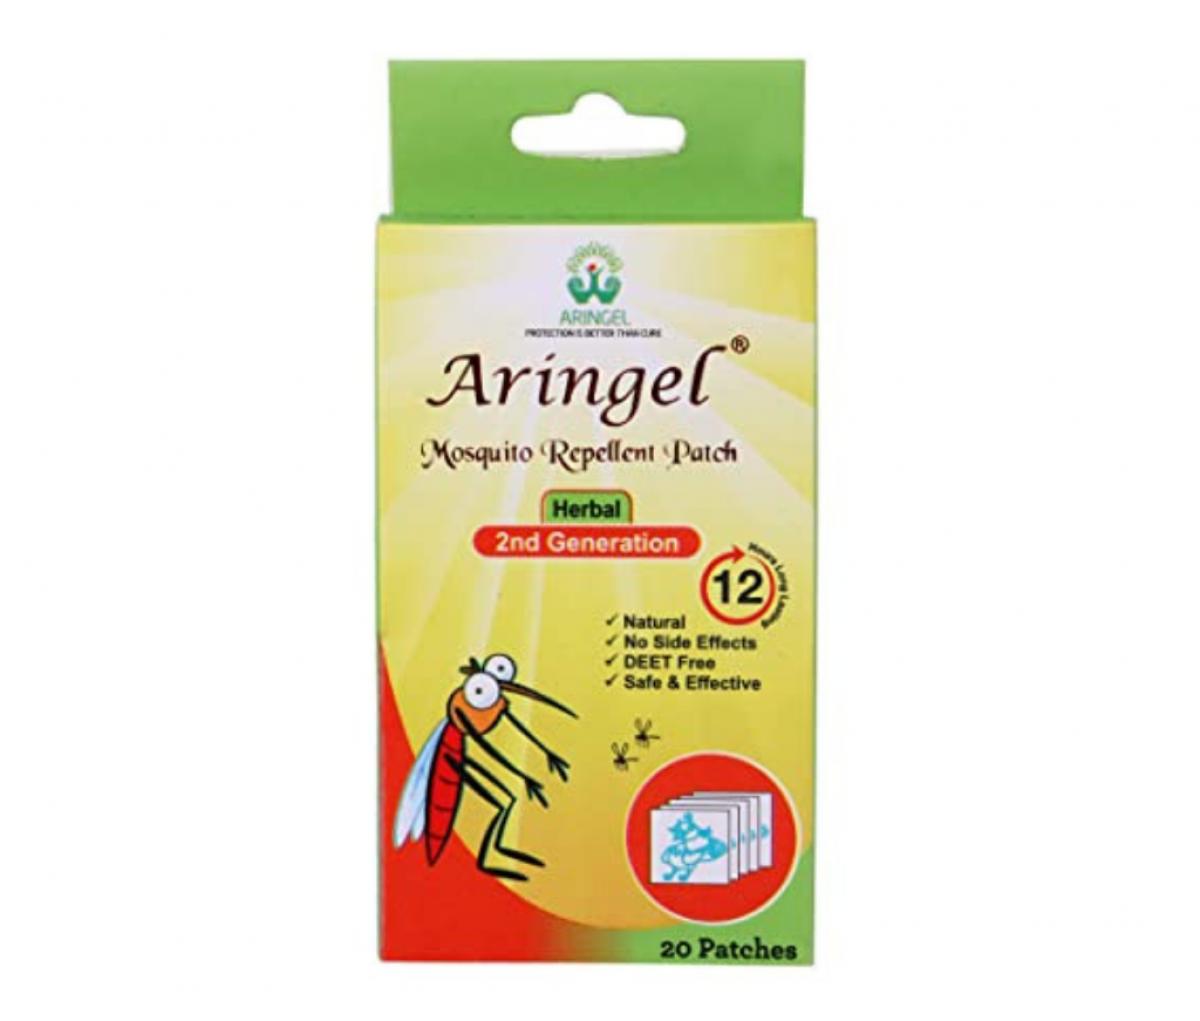 ARINGEL Mosquito Repellent 2nd 20's